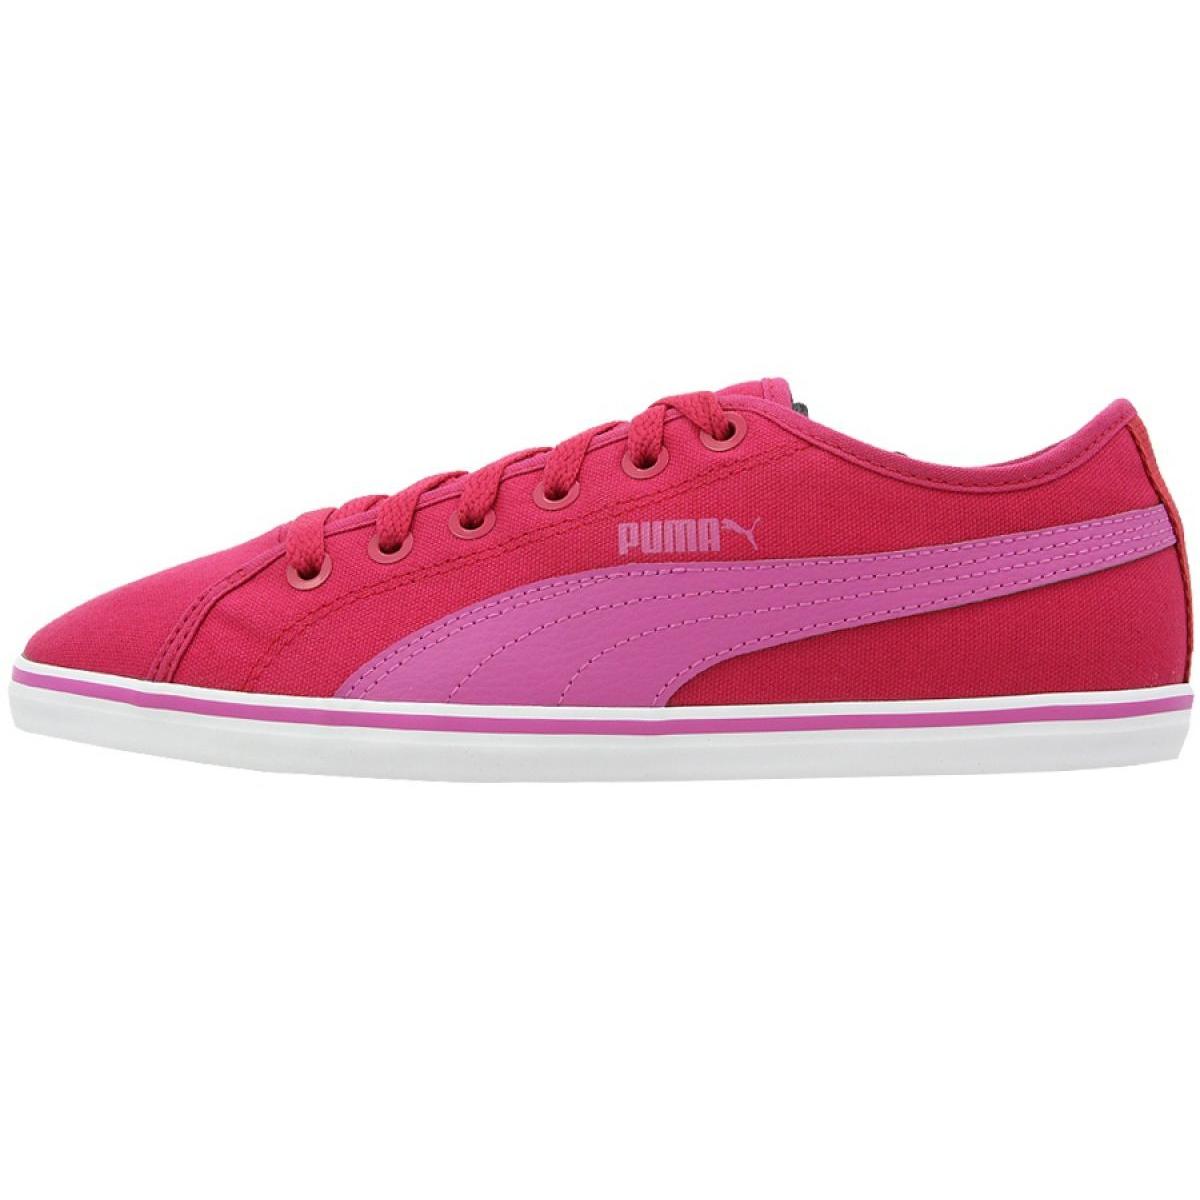 Rosa Zapatos Puma Elsu v2 Cv W 359940 05